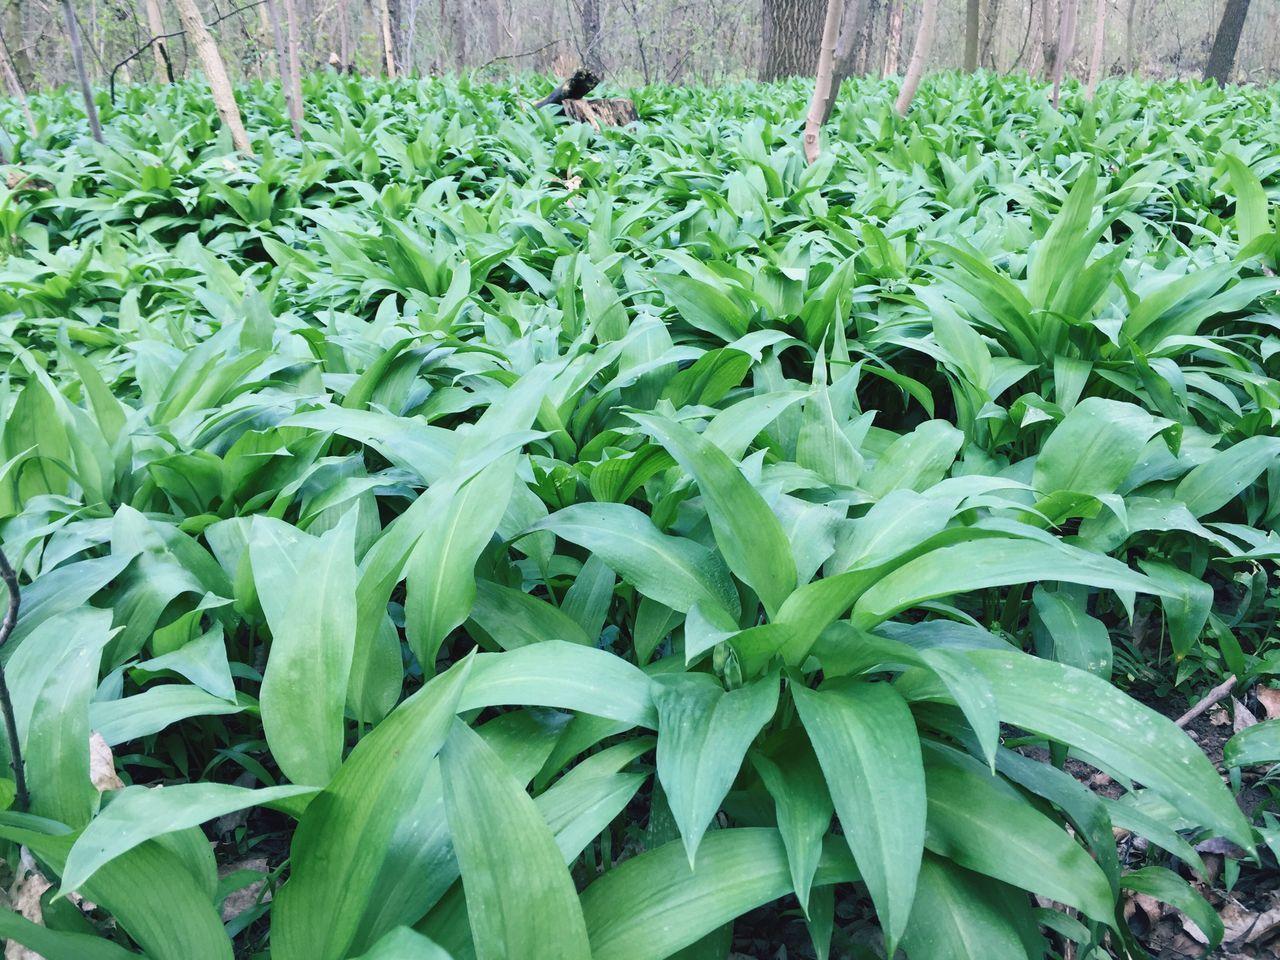 Bärlauch  Forest Green Plant Ramson Green Green Green!  Green Color #wildgarlic